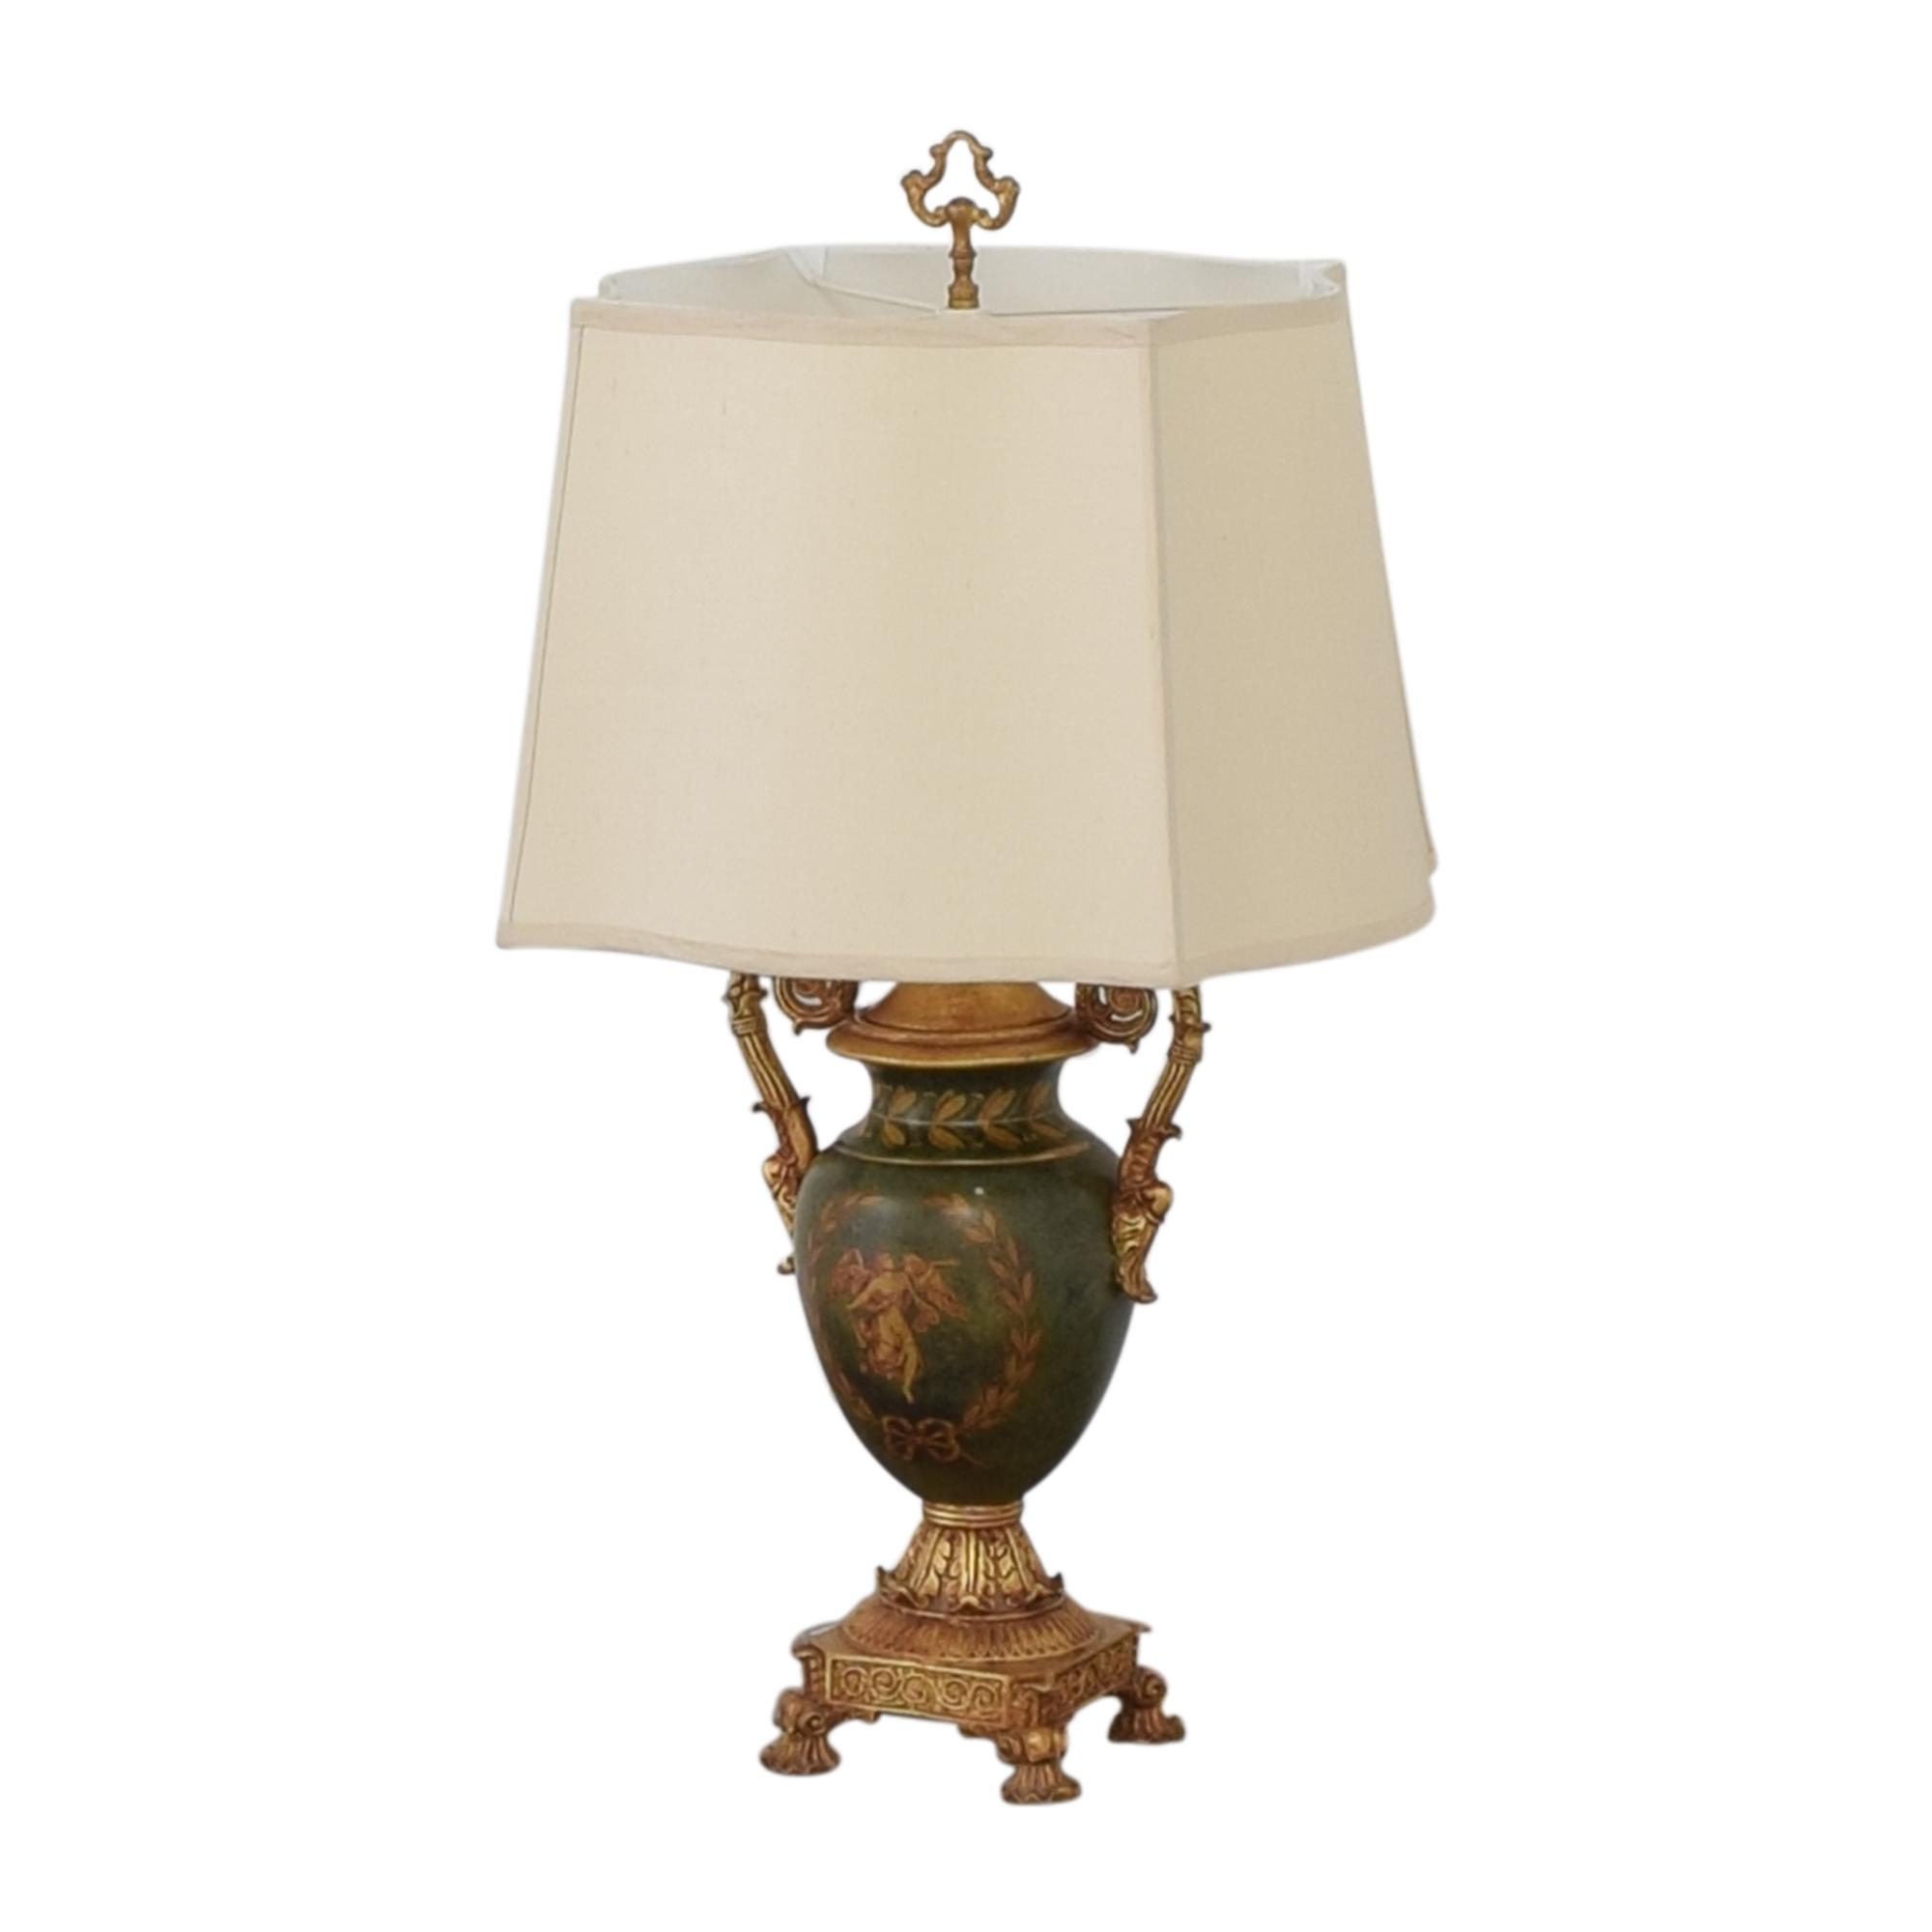 Frederick Cooper Frederick Cooper Urn Lamp Lamps